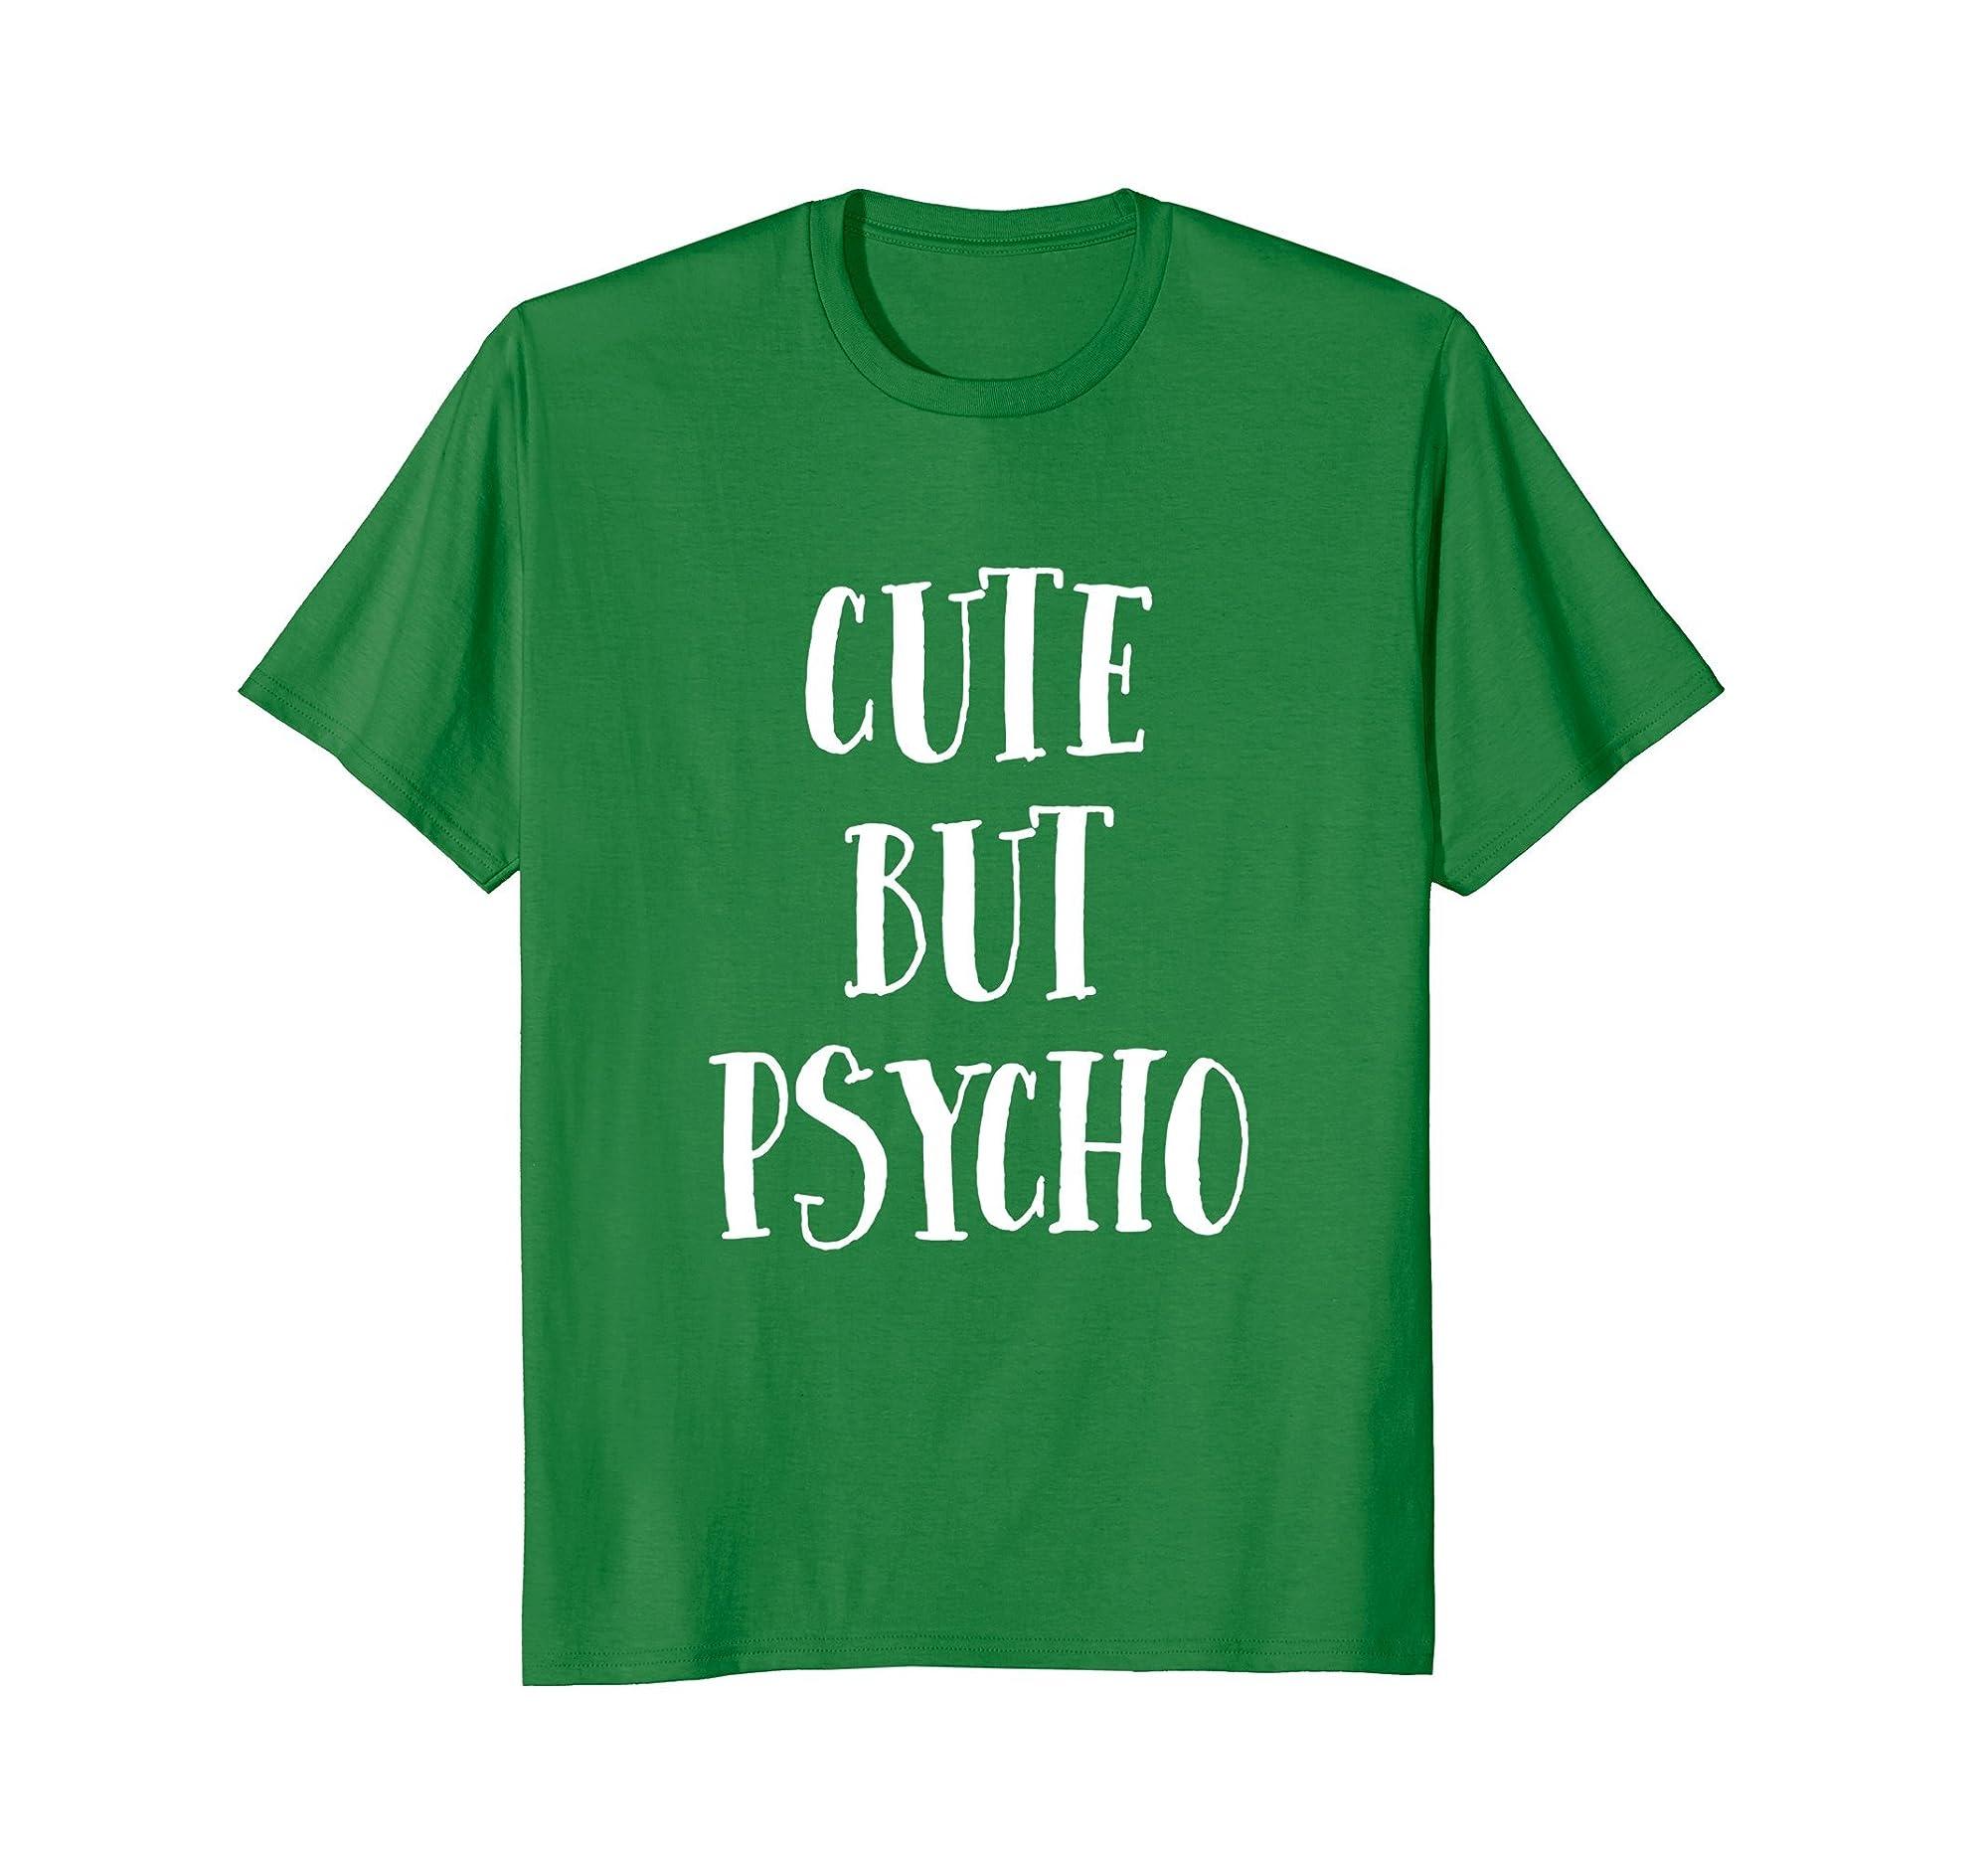 Funny Sarcastic Teenager Humor Cute But Psycho T Shirt